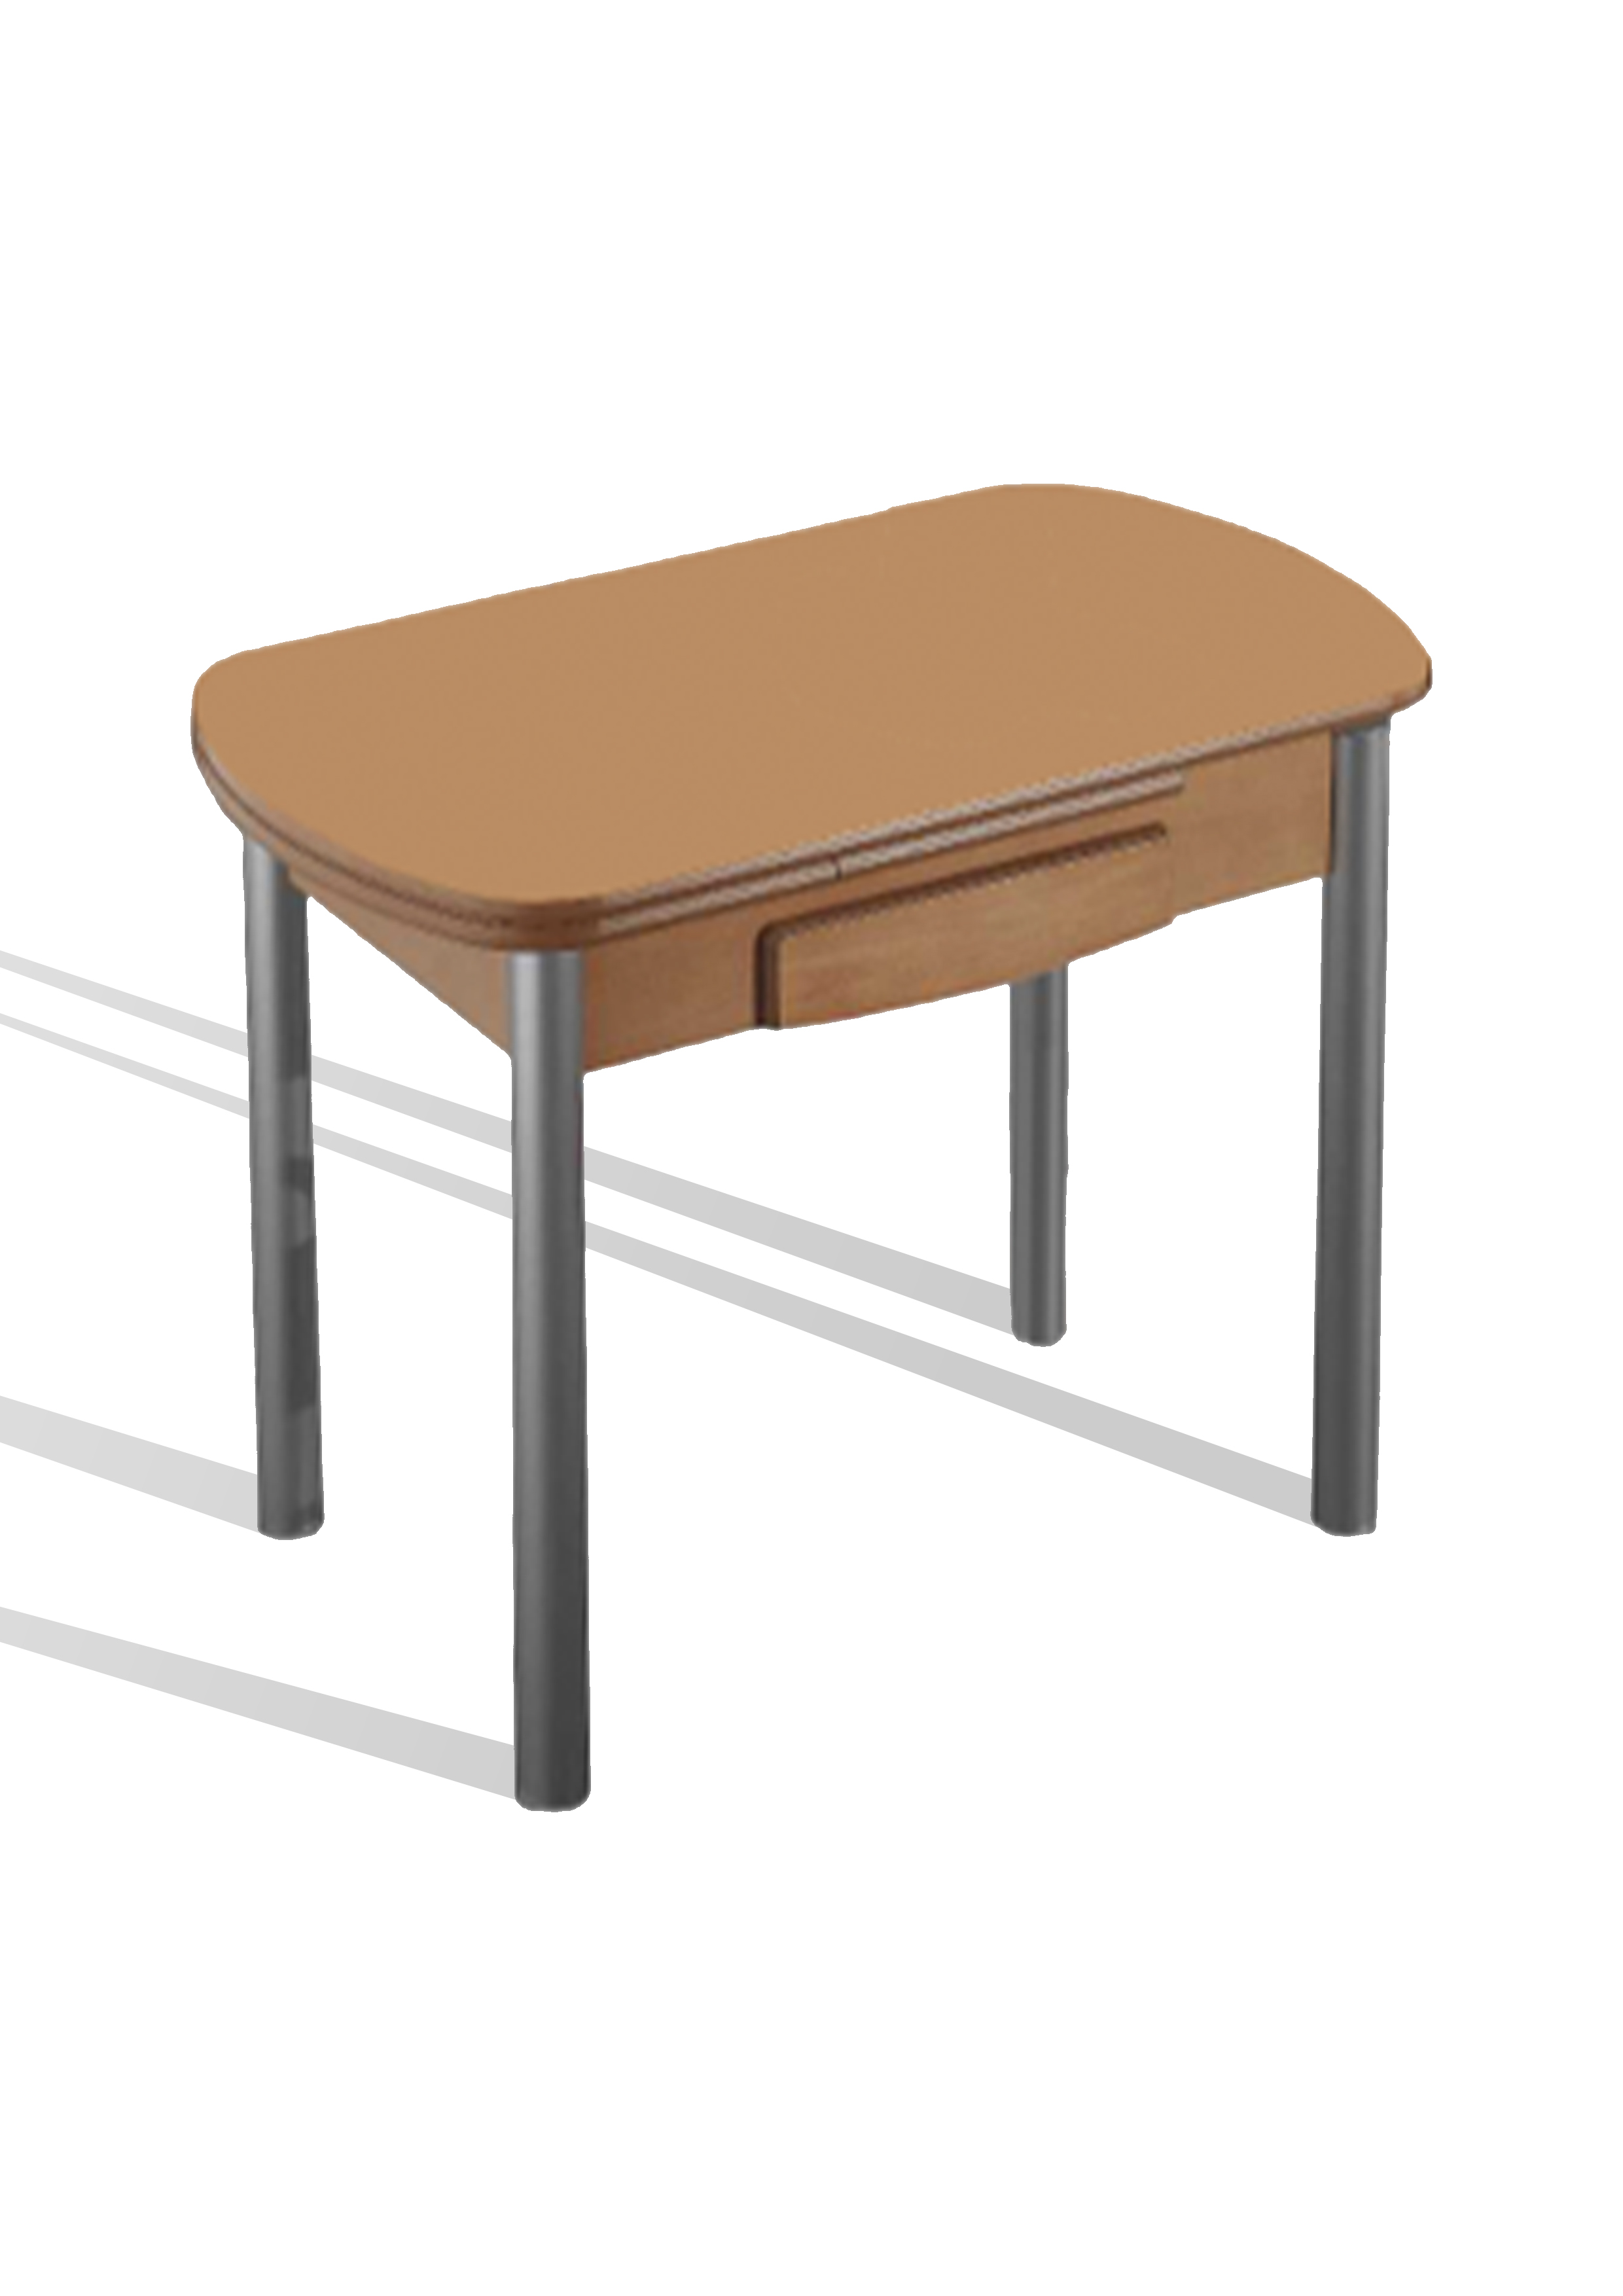 Mesas de cocina originales sillas de cocina modernas baratas for Mesas diseno baratas